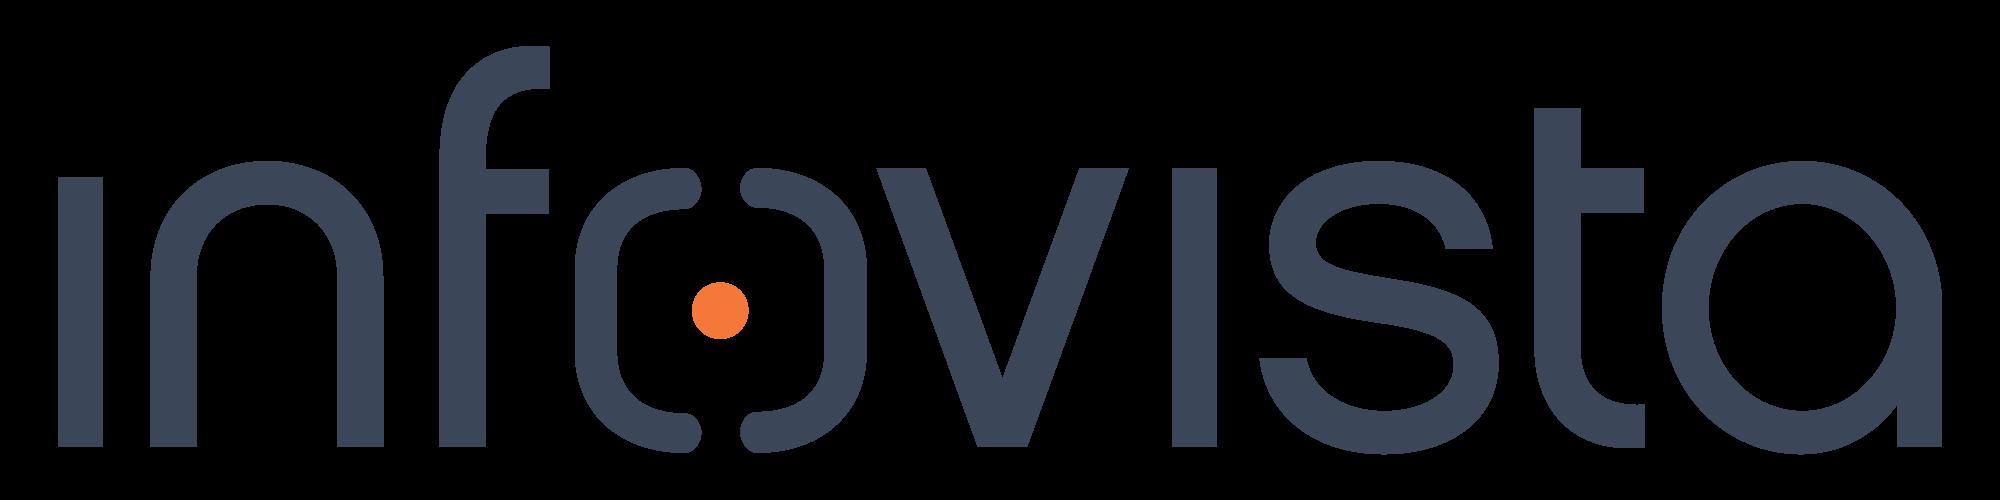 logo-infovista